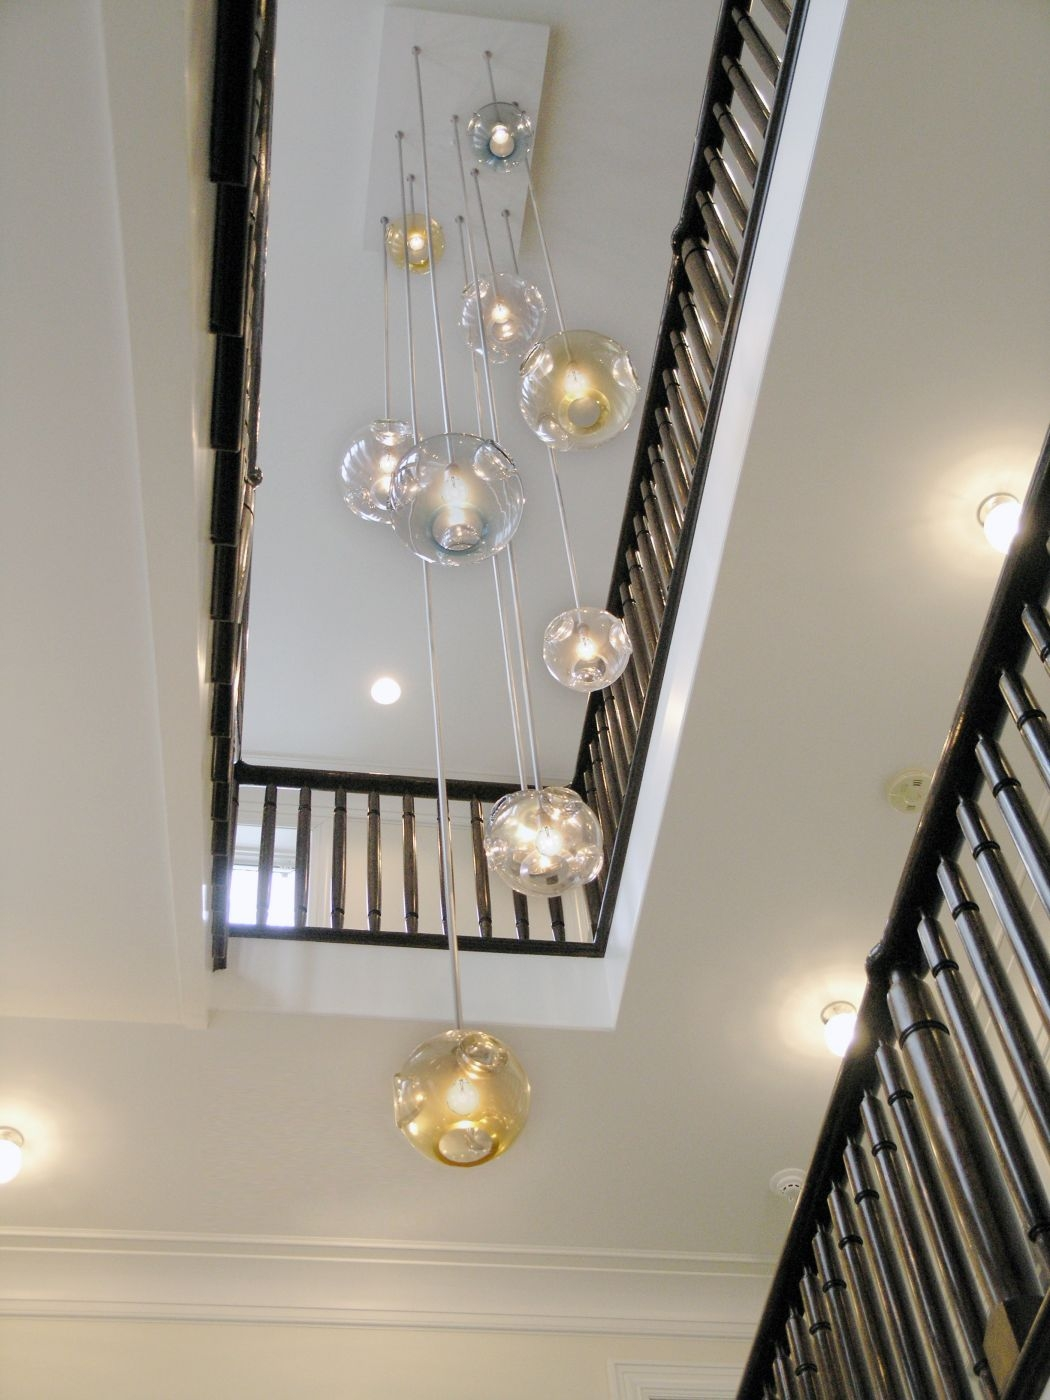 Jgooddesign Aqua Chandelier For Stairwell Chandelier (Photo 2 of 15)